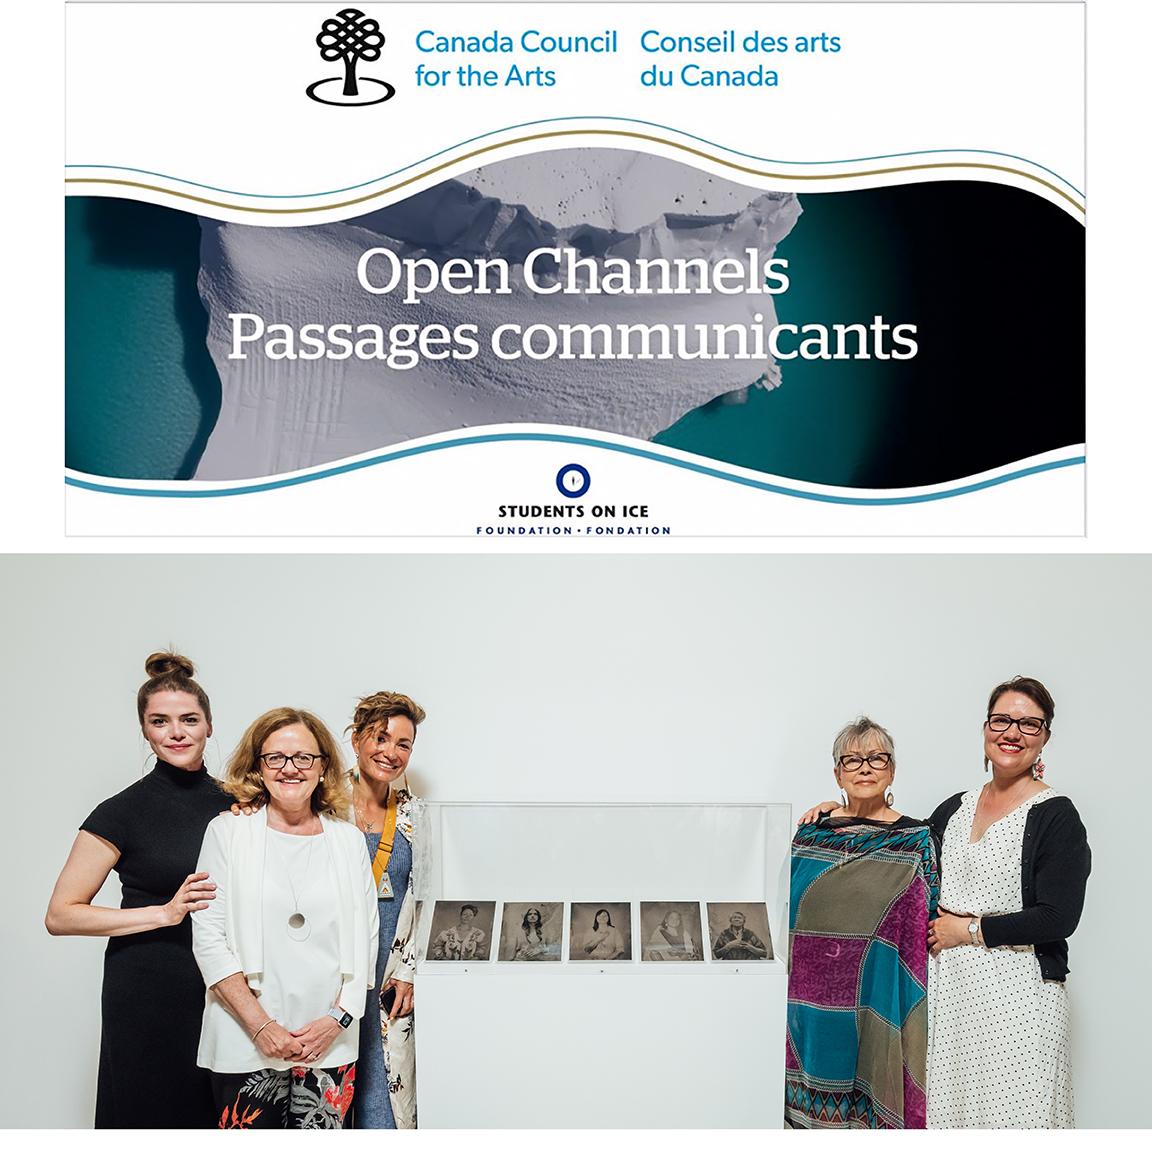 """ Open Channels"" Exhibition, Âjagemô Art Space, Canada Council for the Arts, Ottawa, Canada. June 25, 2019.(Kaniehtí:io Horn, Christine Fitzgerald, Waneek Horn-Miller, Kahentinétha' Horn and Dr. Kahente Horn-Miller.) (Photo credit: Martin Lipman)"